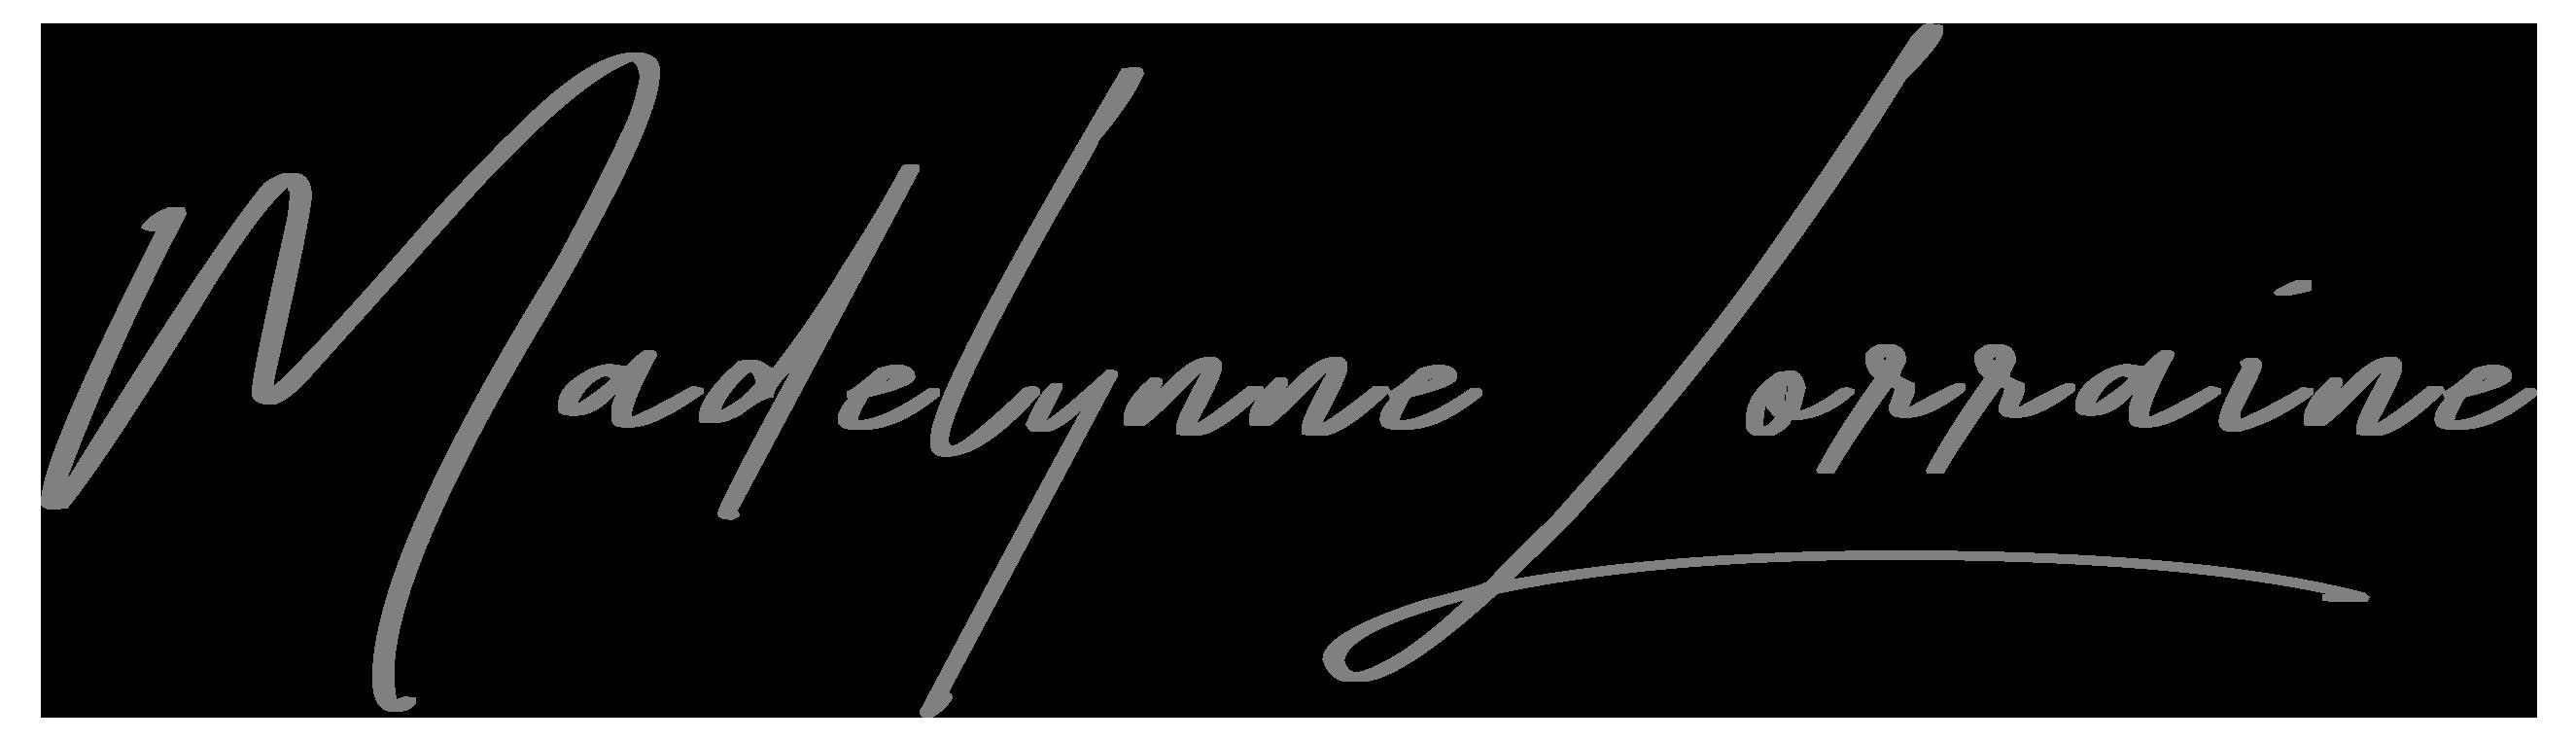 Madelynne Lorraine